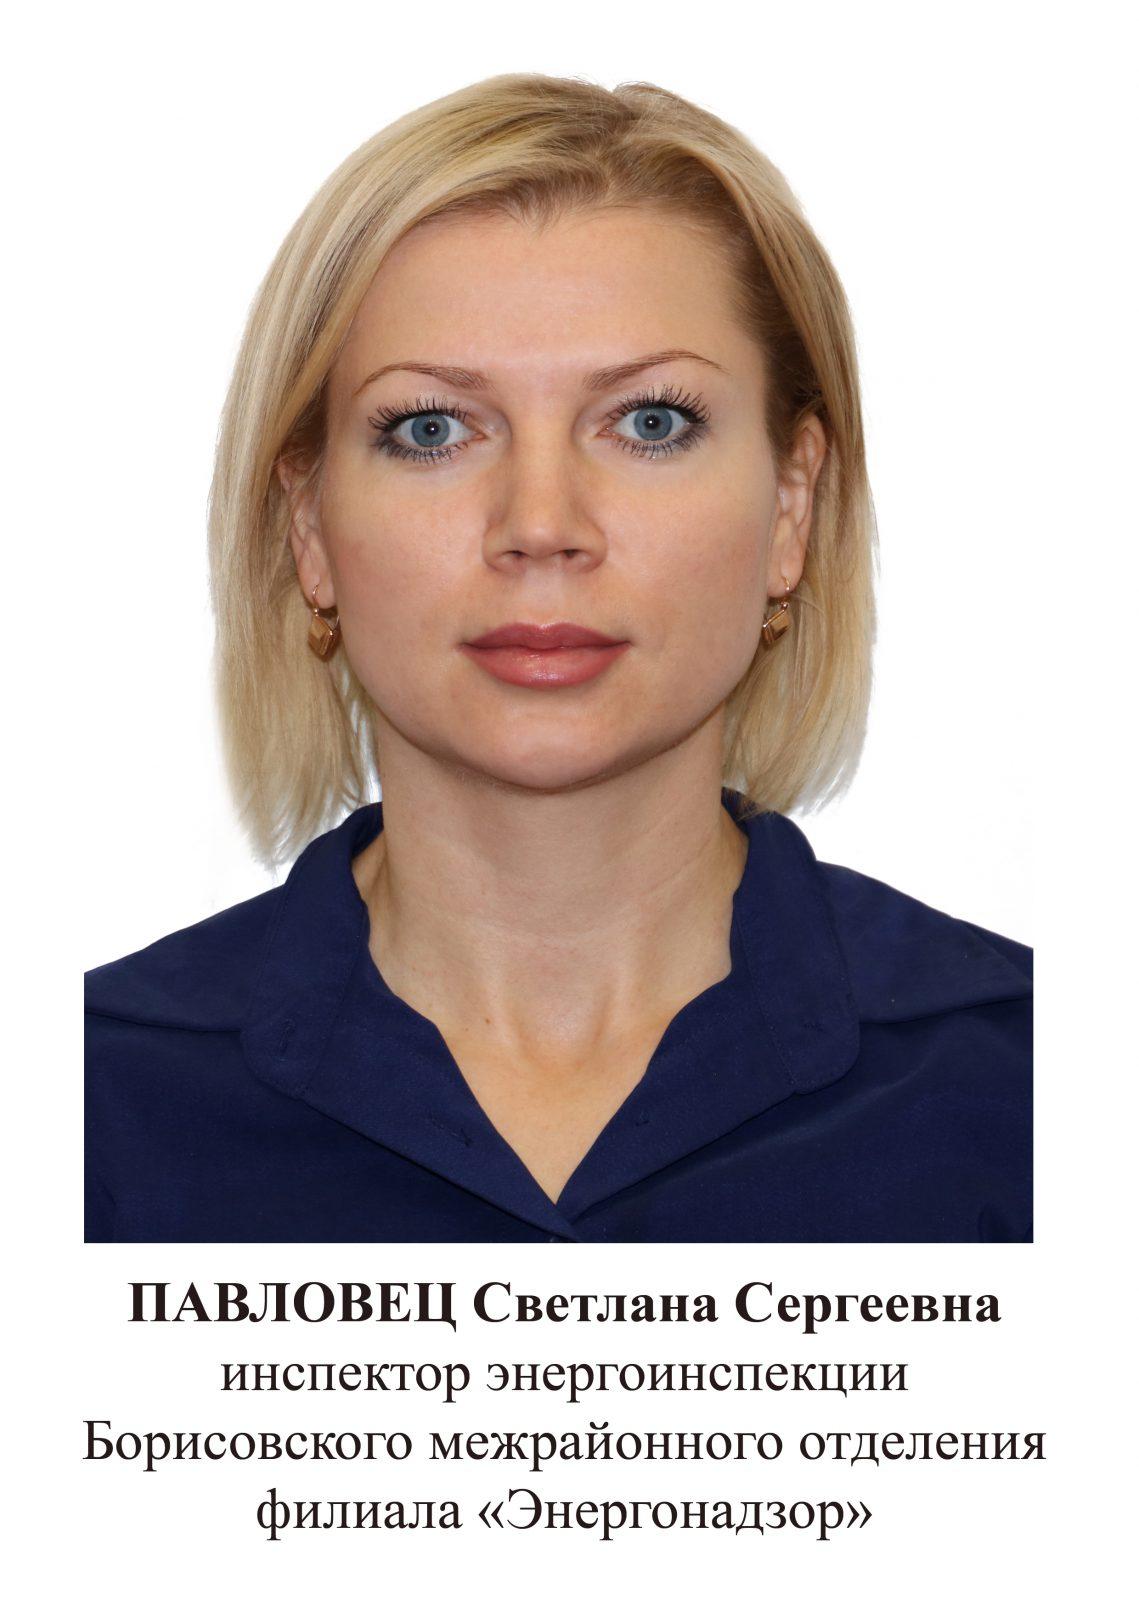 Павловец Светлана Сергеевна